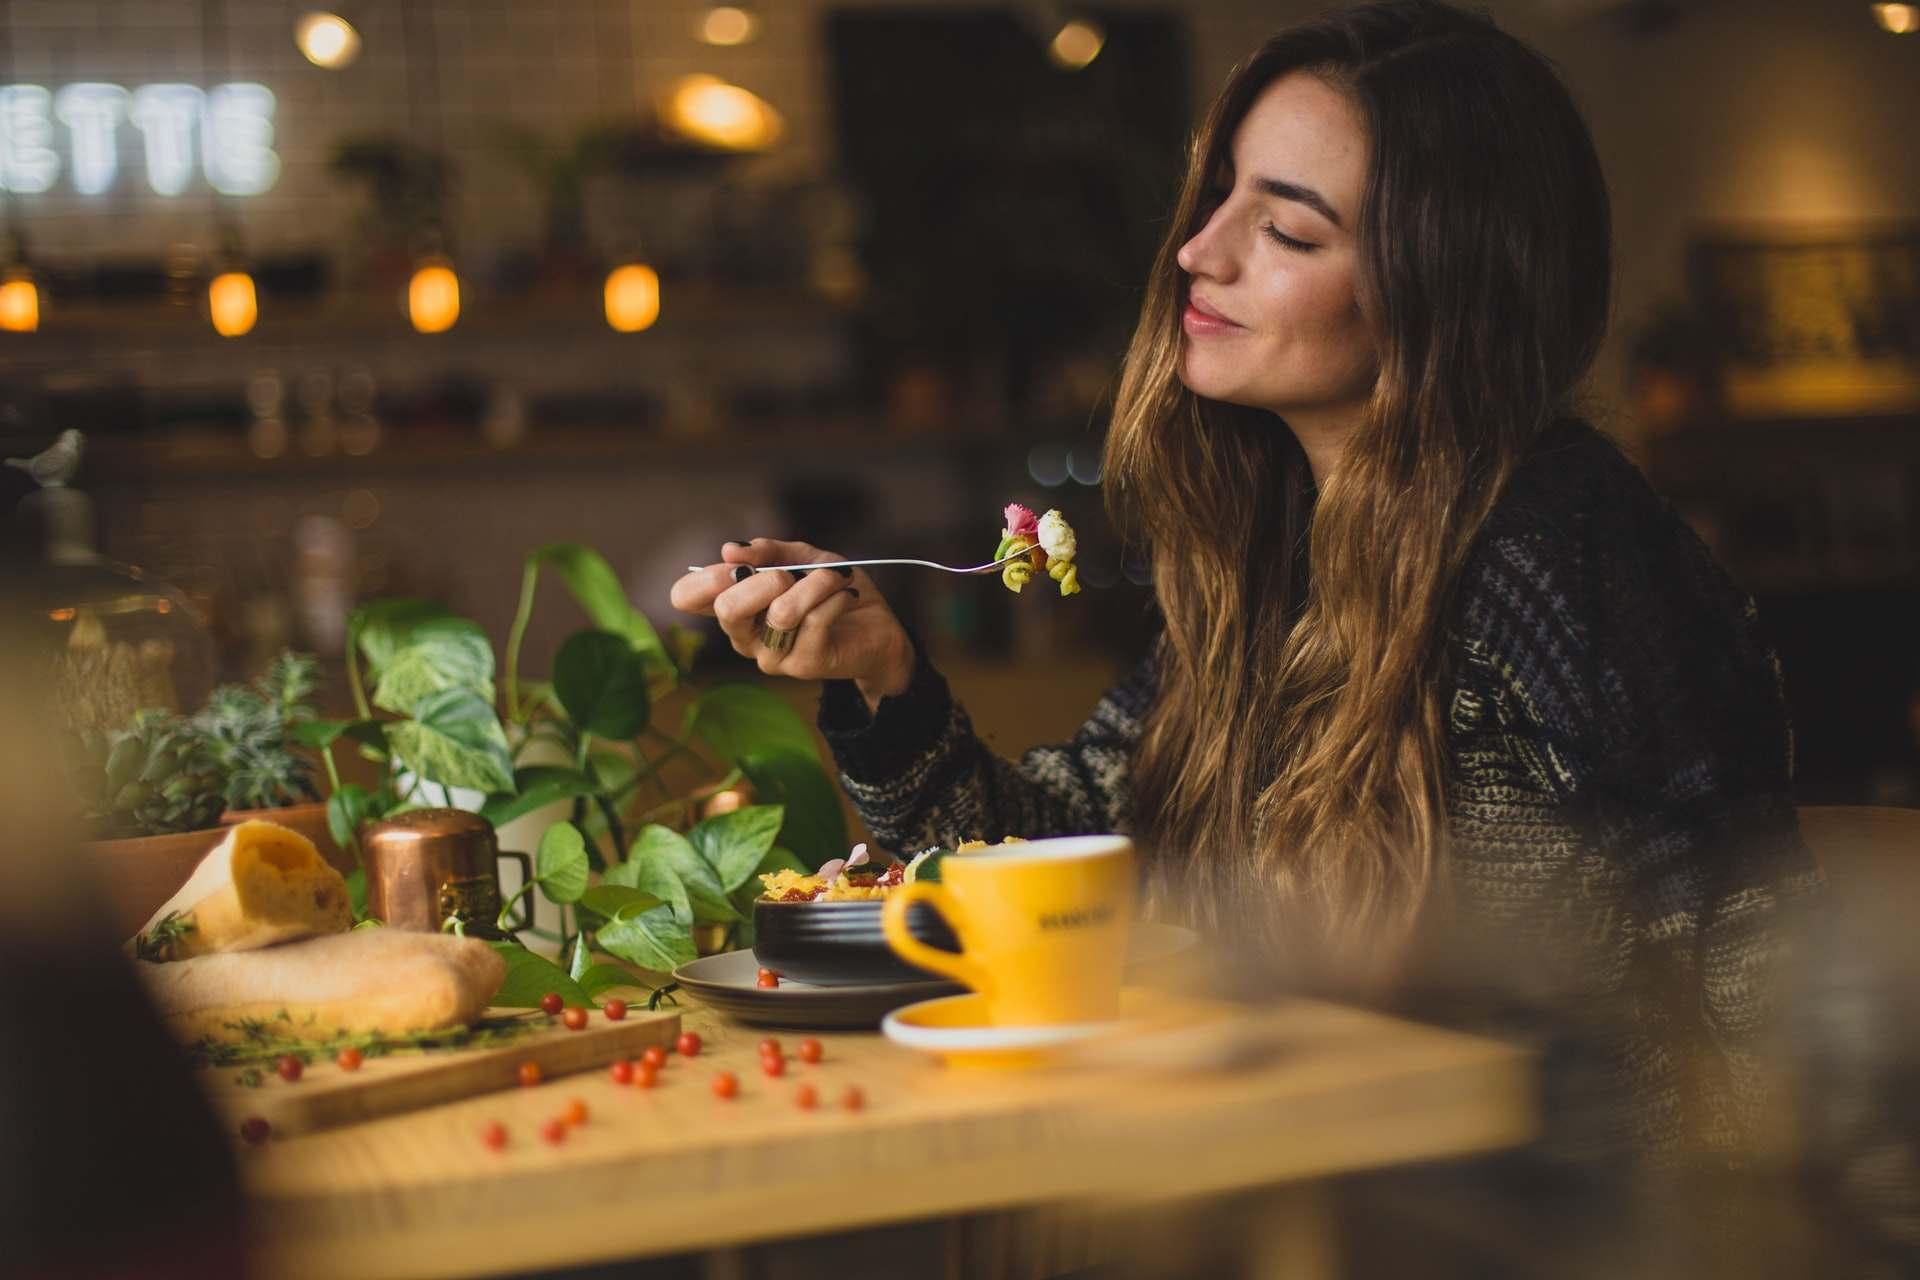 Kesehatan Ususmu Penting Bagi Kesehatan Seluruh Tubuh